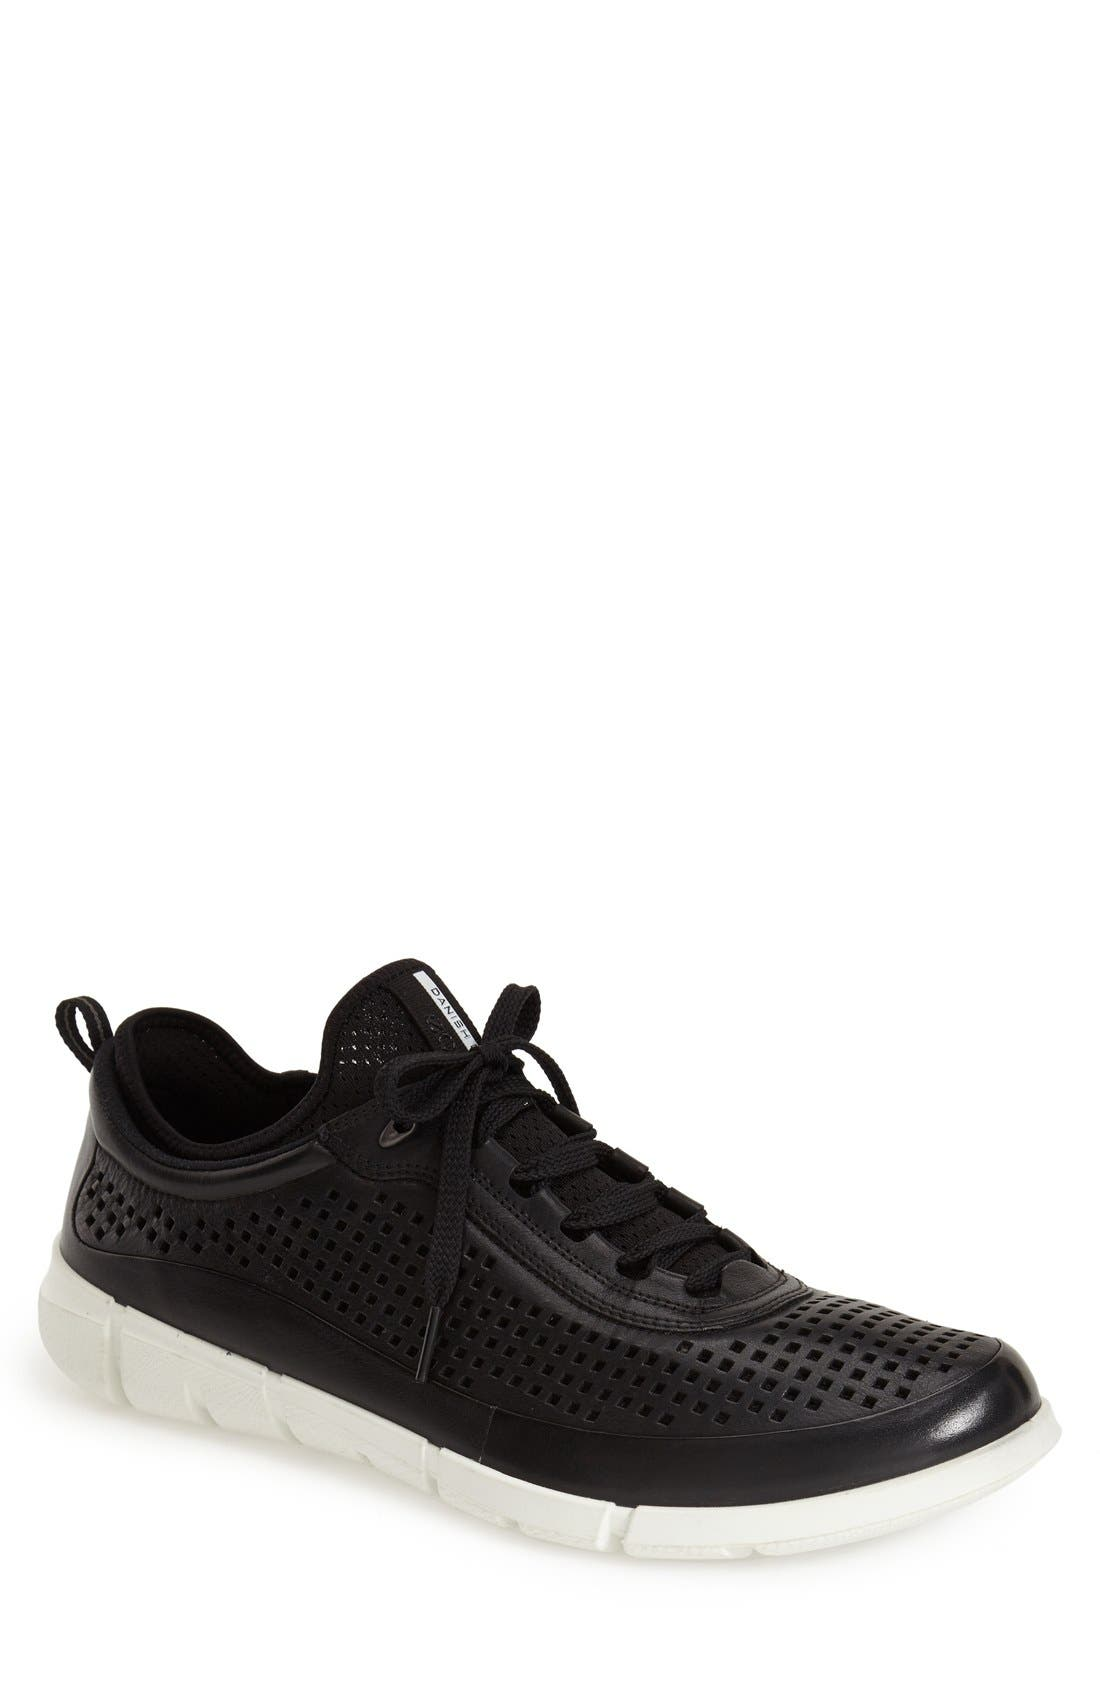 ECCO 'Intrinsic' Sneaker